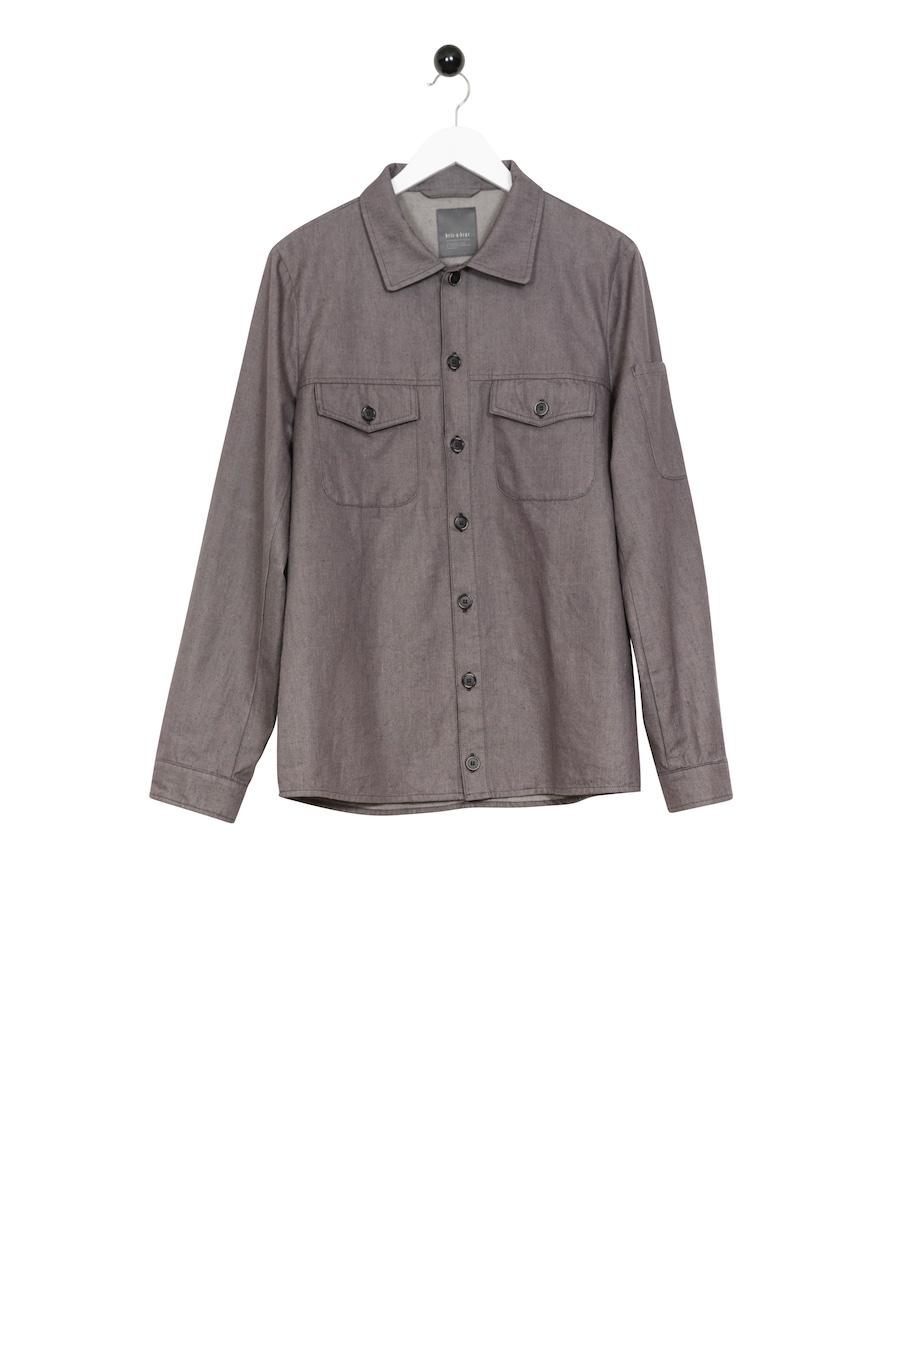 Tersk Shirt Jacket